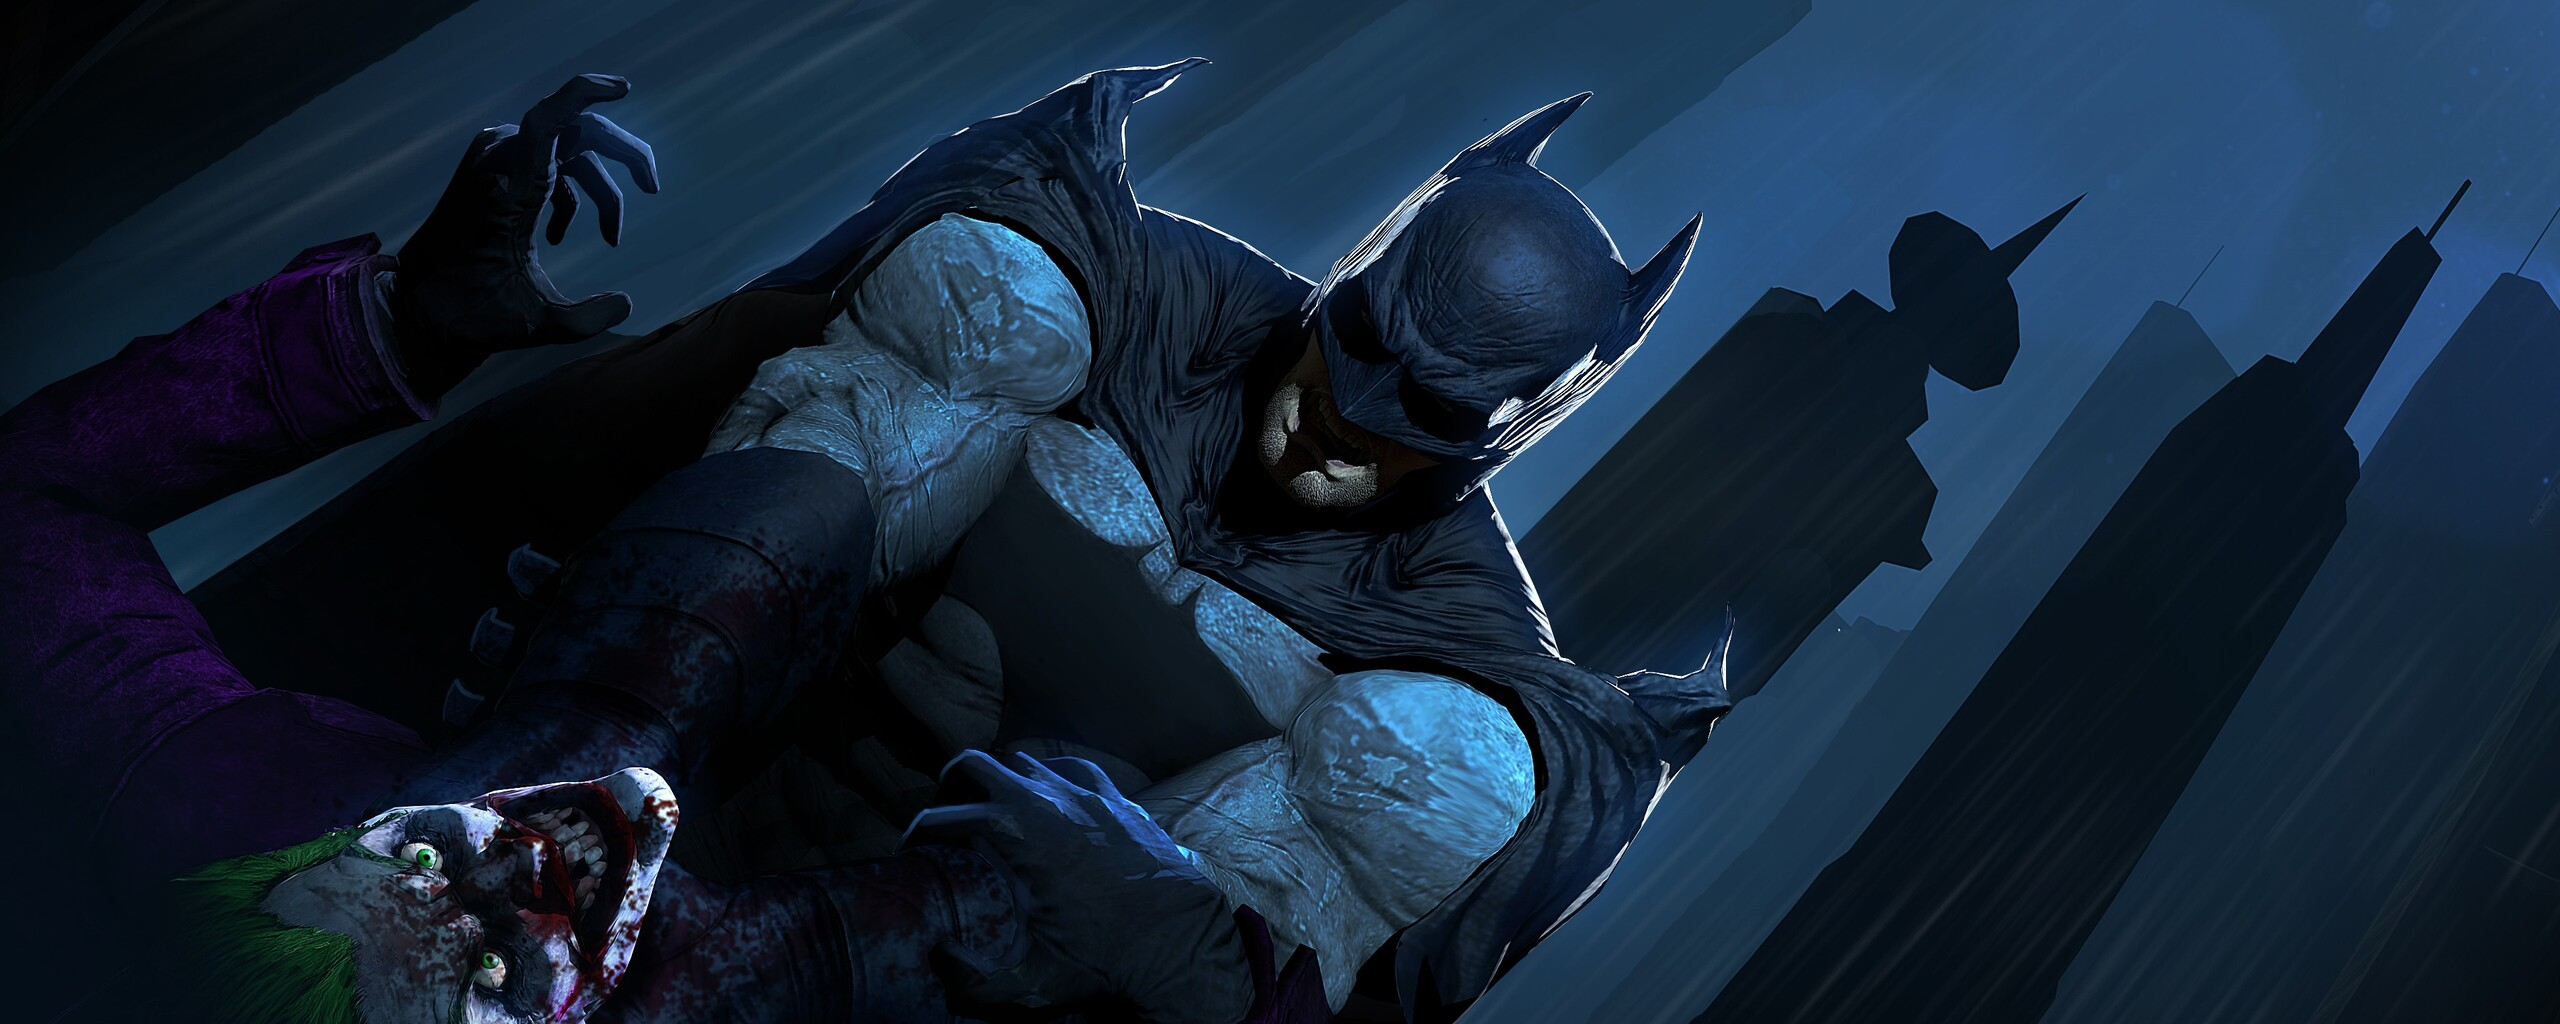 joker-vs-batman-4k-p8.jpg